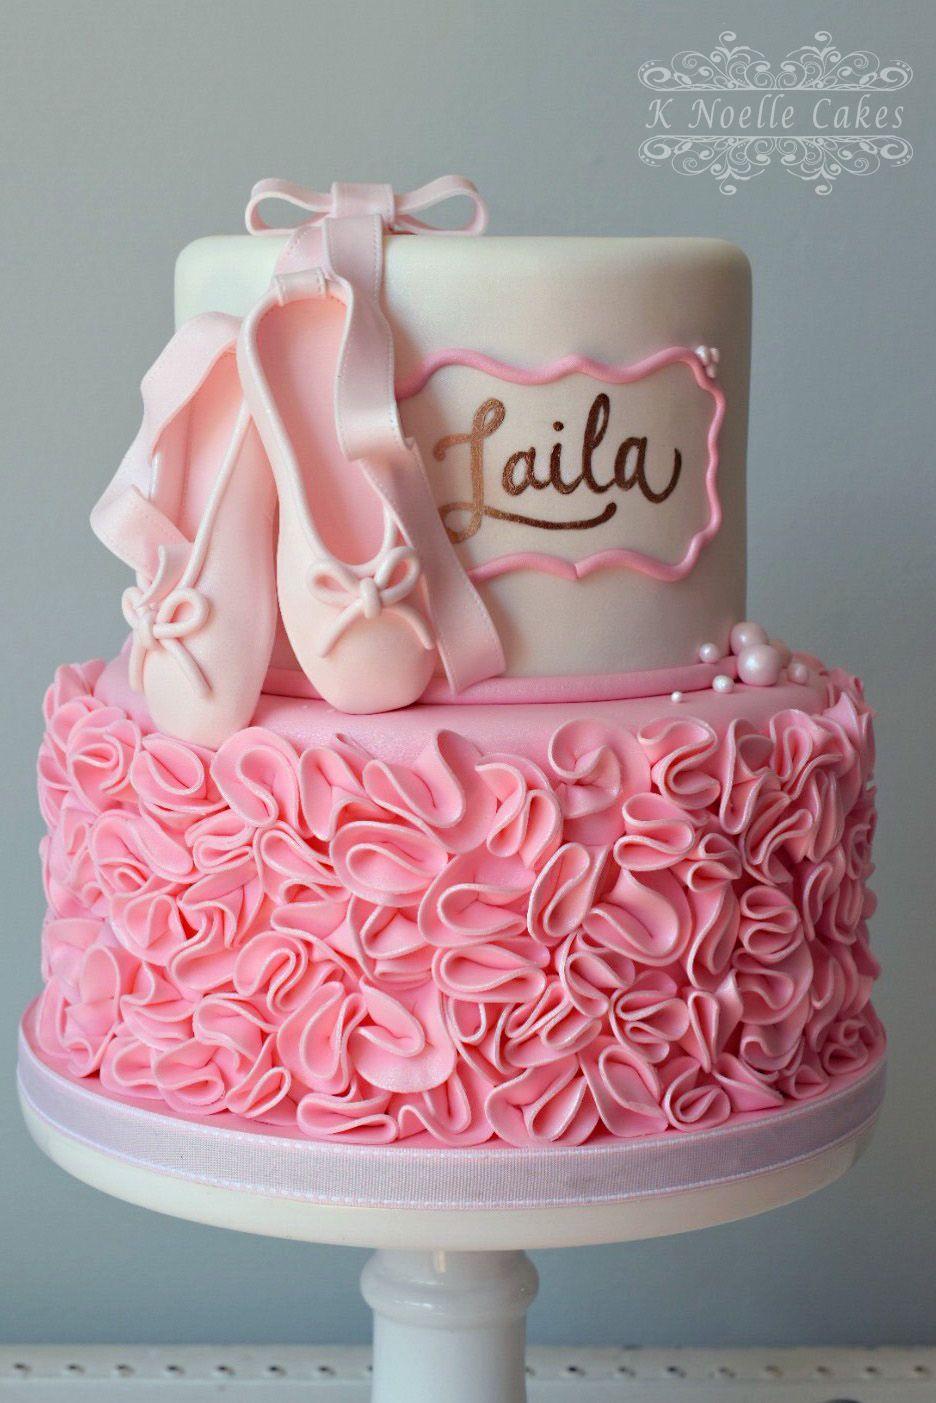 Ballerina Theme Birthday Cake By K Noelle Cakes Cakes By K - Ballet birthday cake